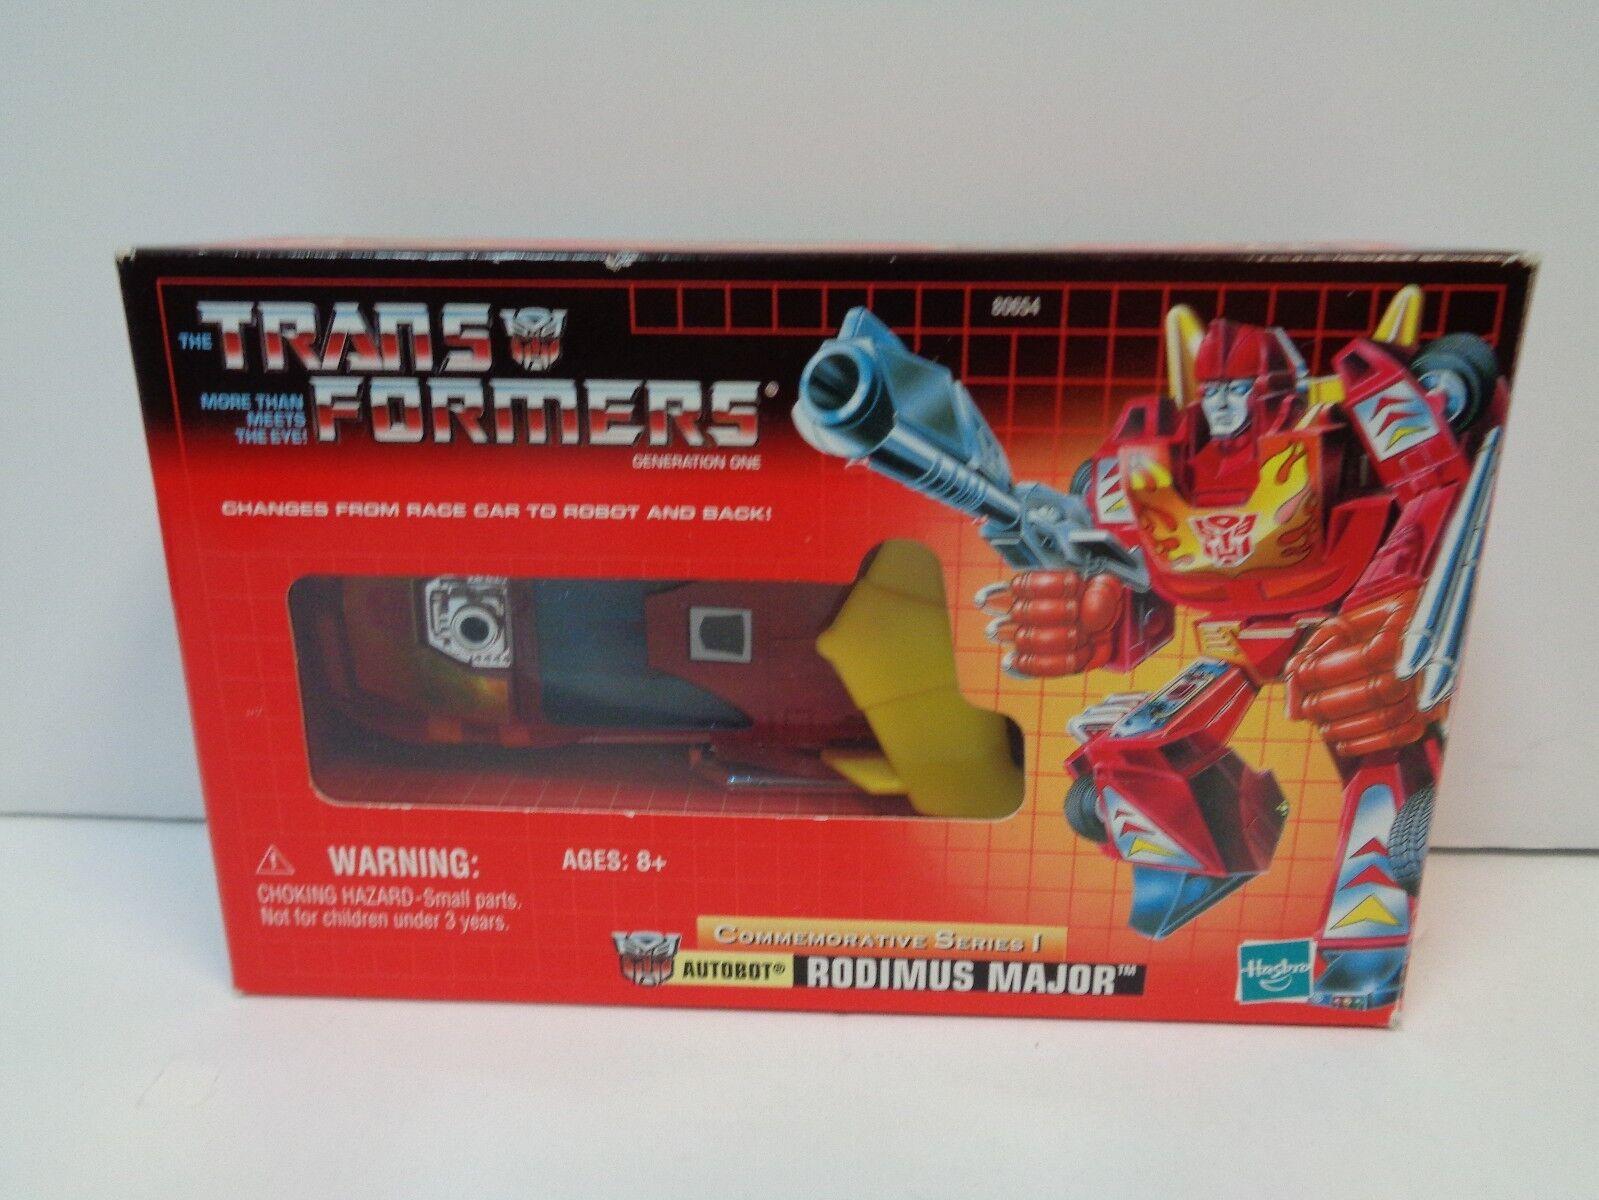 Transformers RODIMUS MAJOR AUTOBOT Classic Re-Issue MIB Commemorative Series I